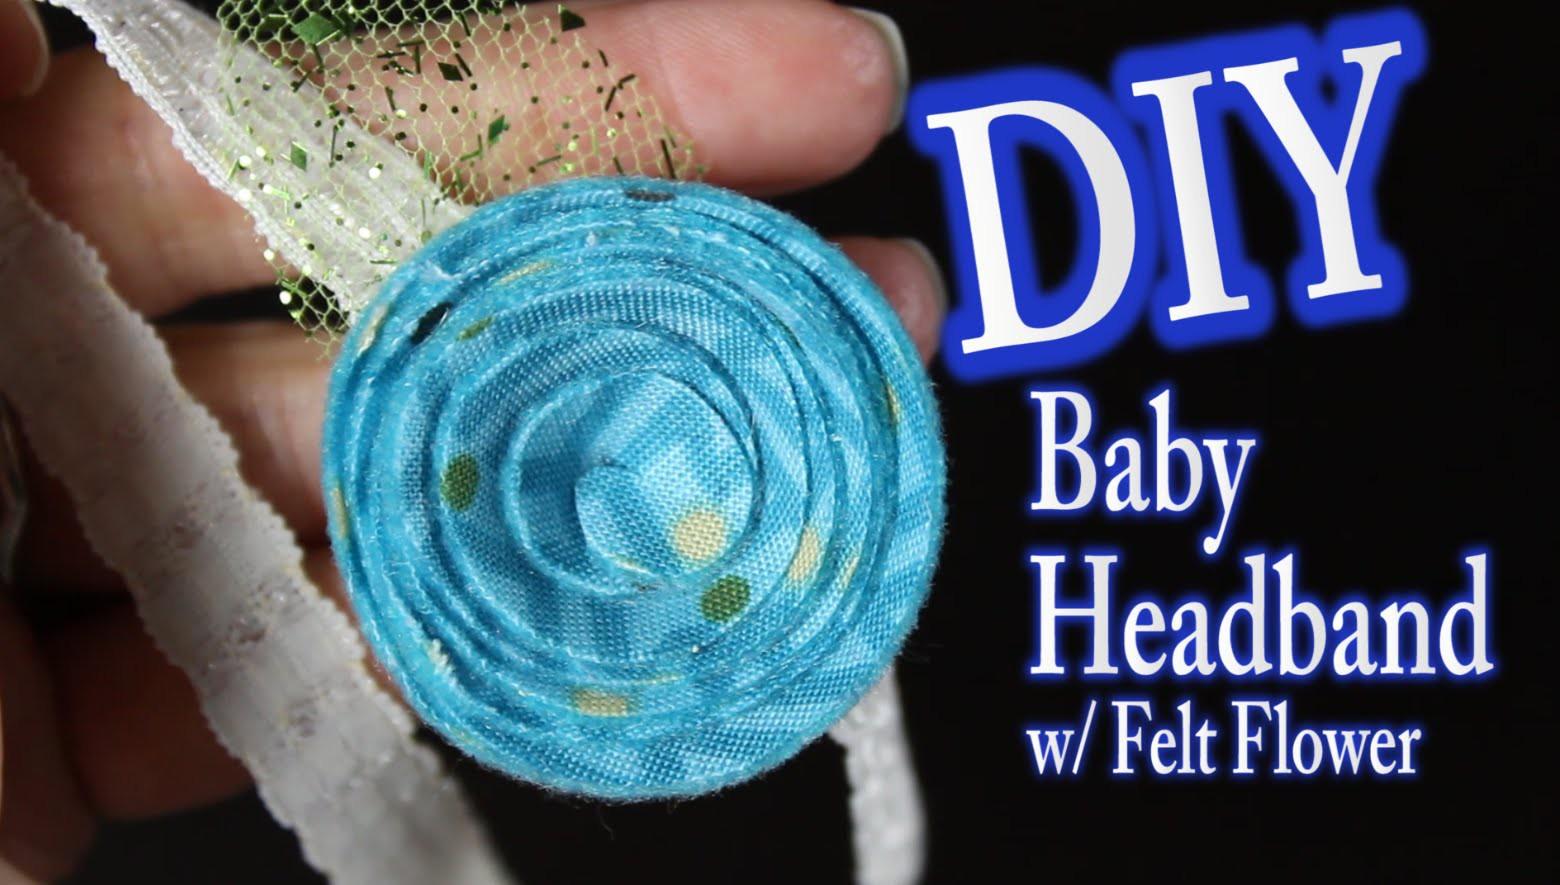 DIY Baby Headband Tutorial With A Felt Flower